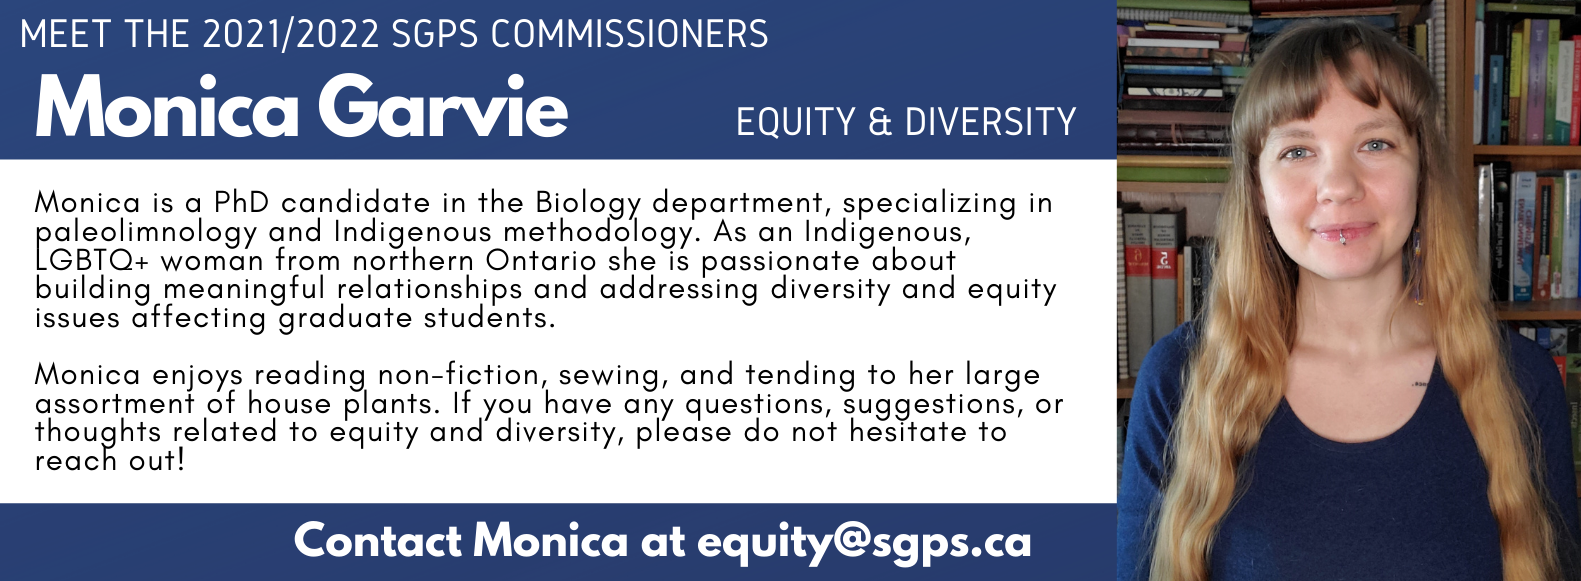 Monica Garvie, SGPS Equity & Diversity Commissioner. Contact Monica at equity@sgps.ca